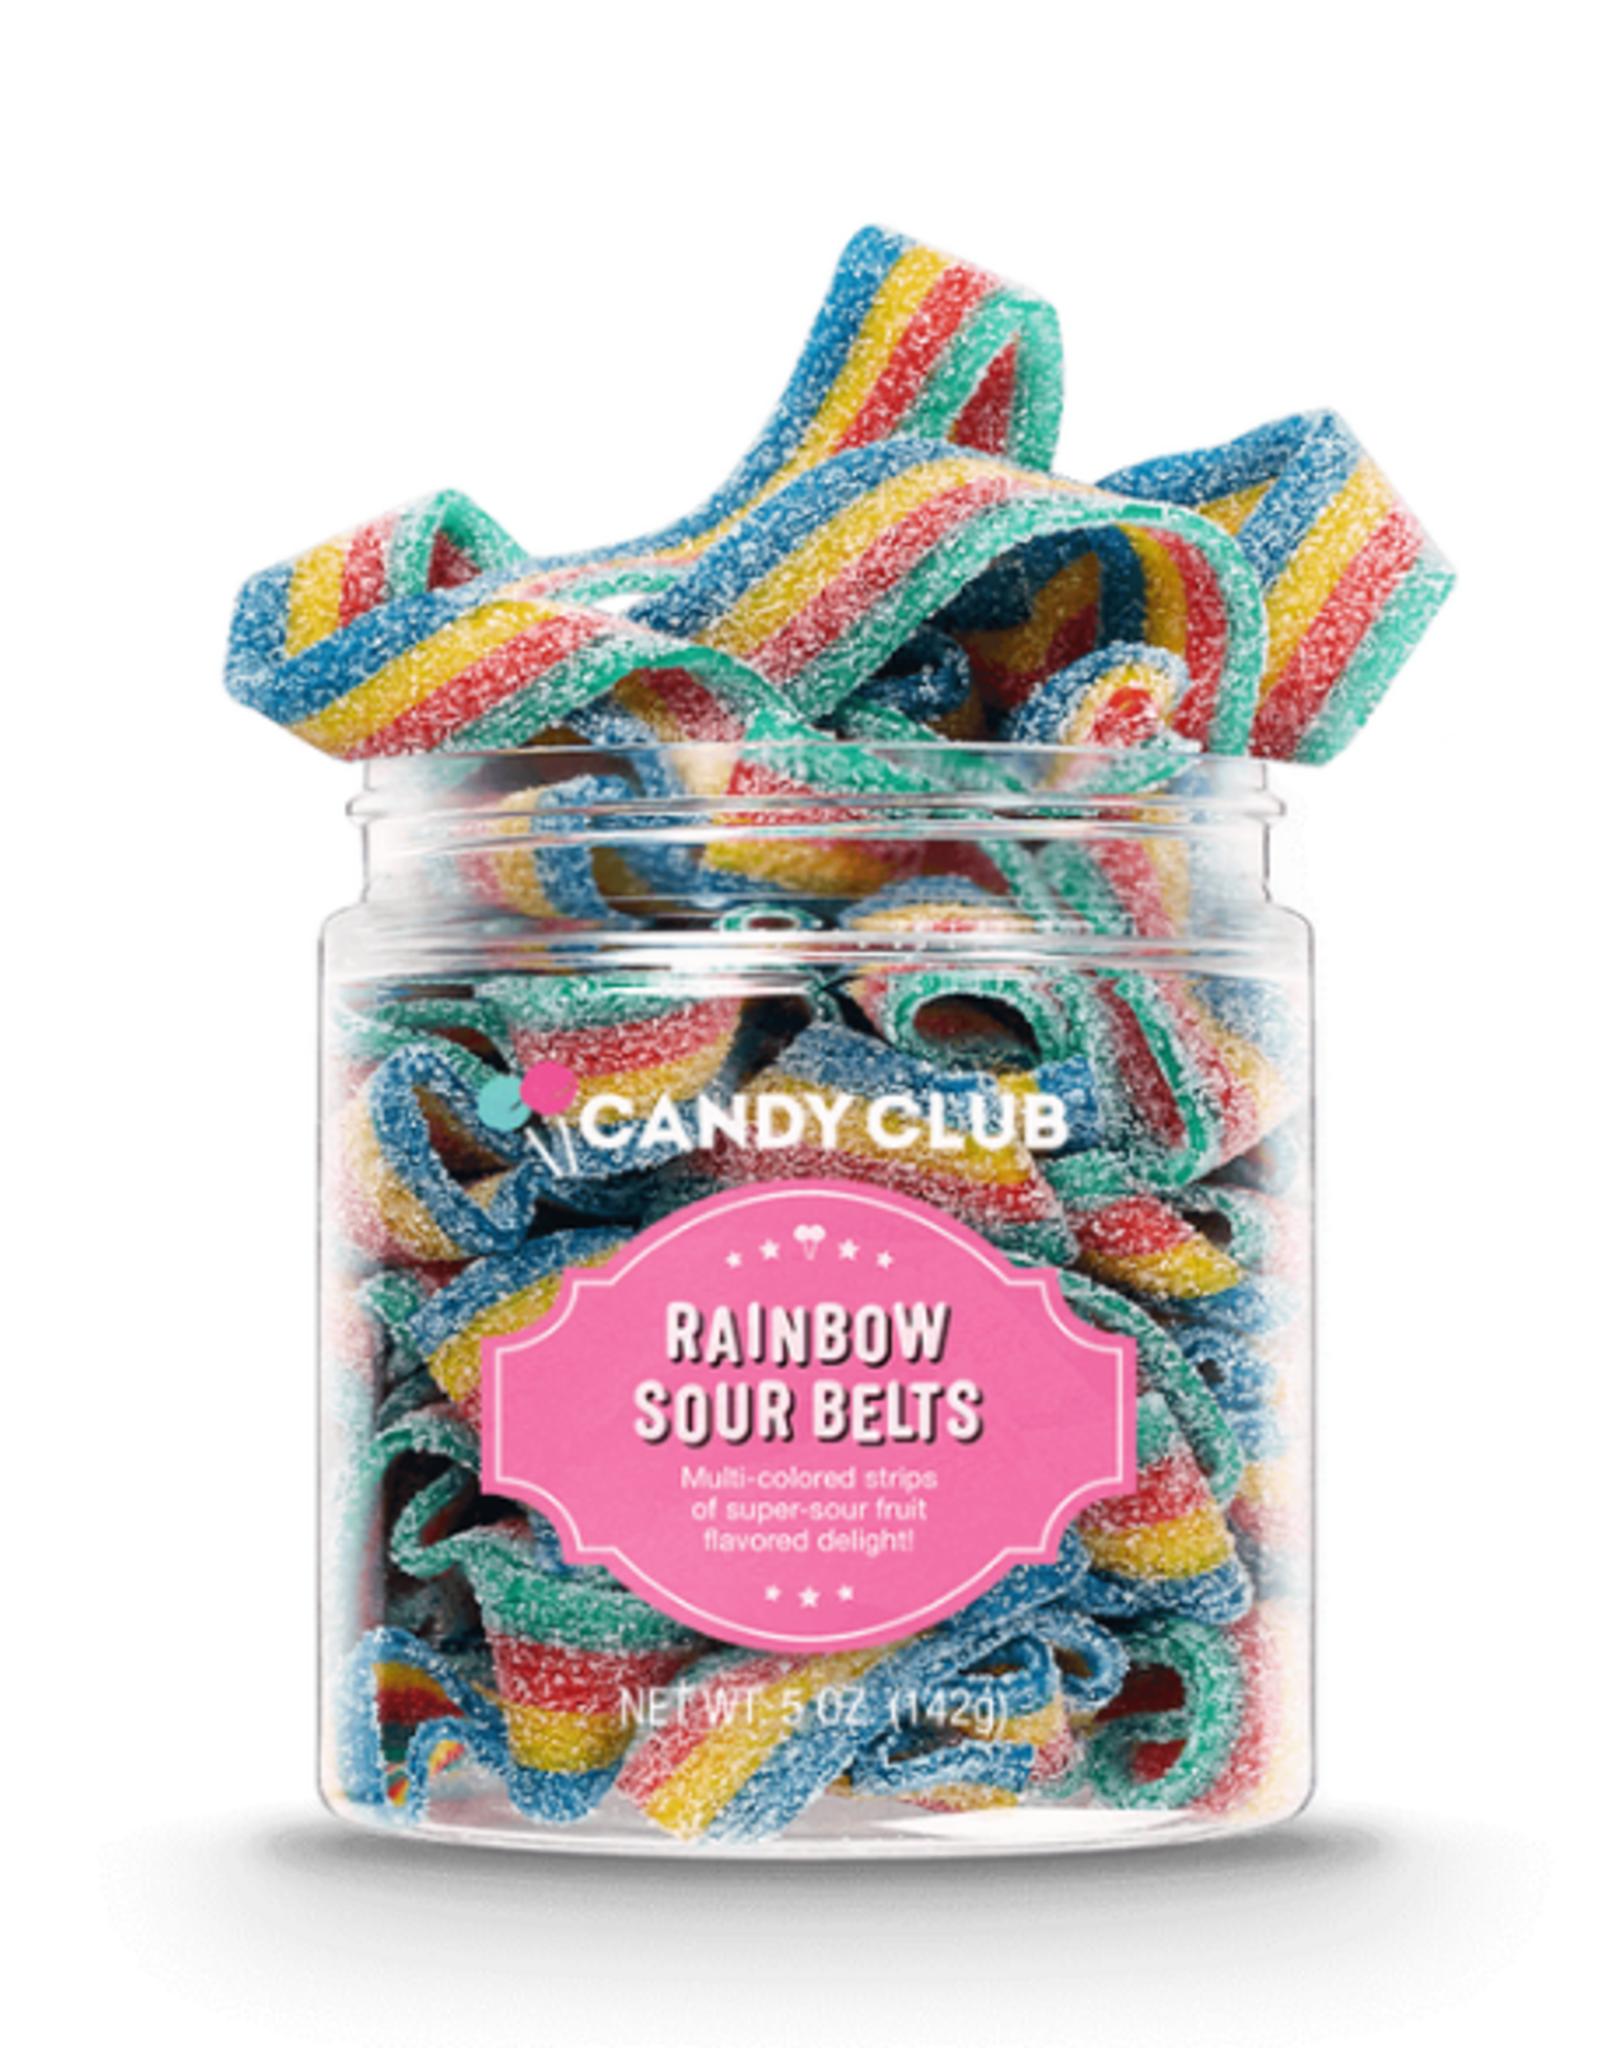 Candy Club Rainbow Sour Belt Candy